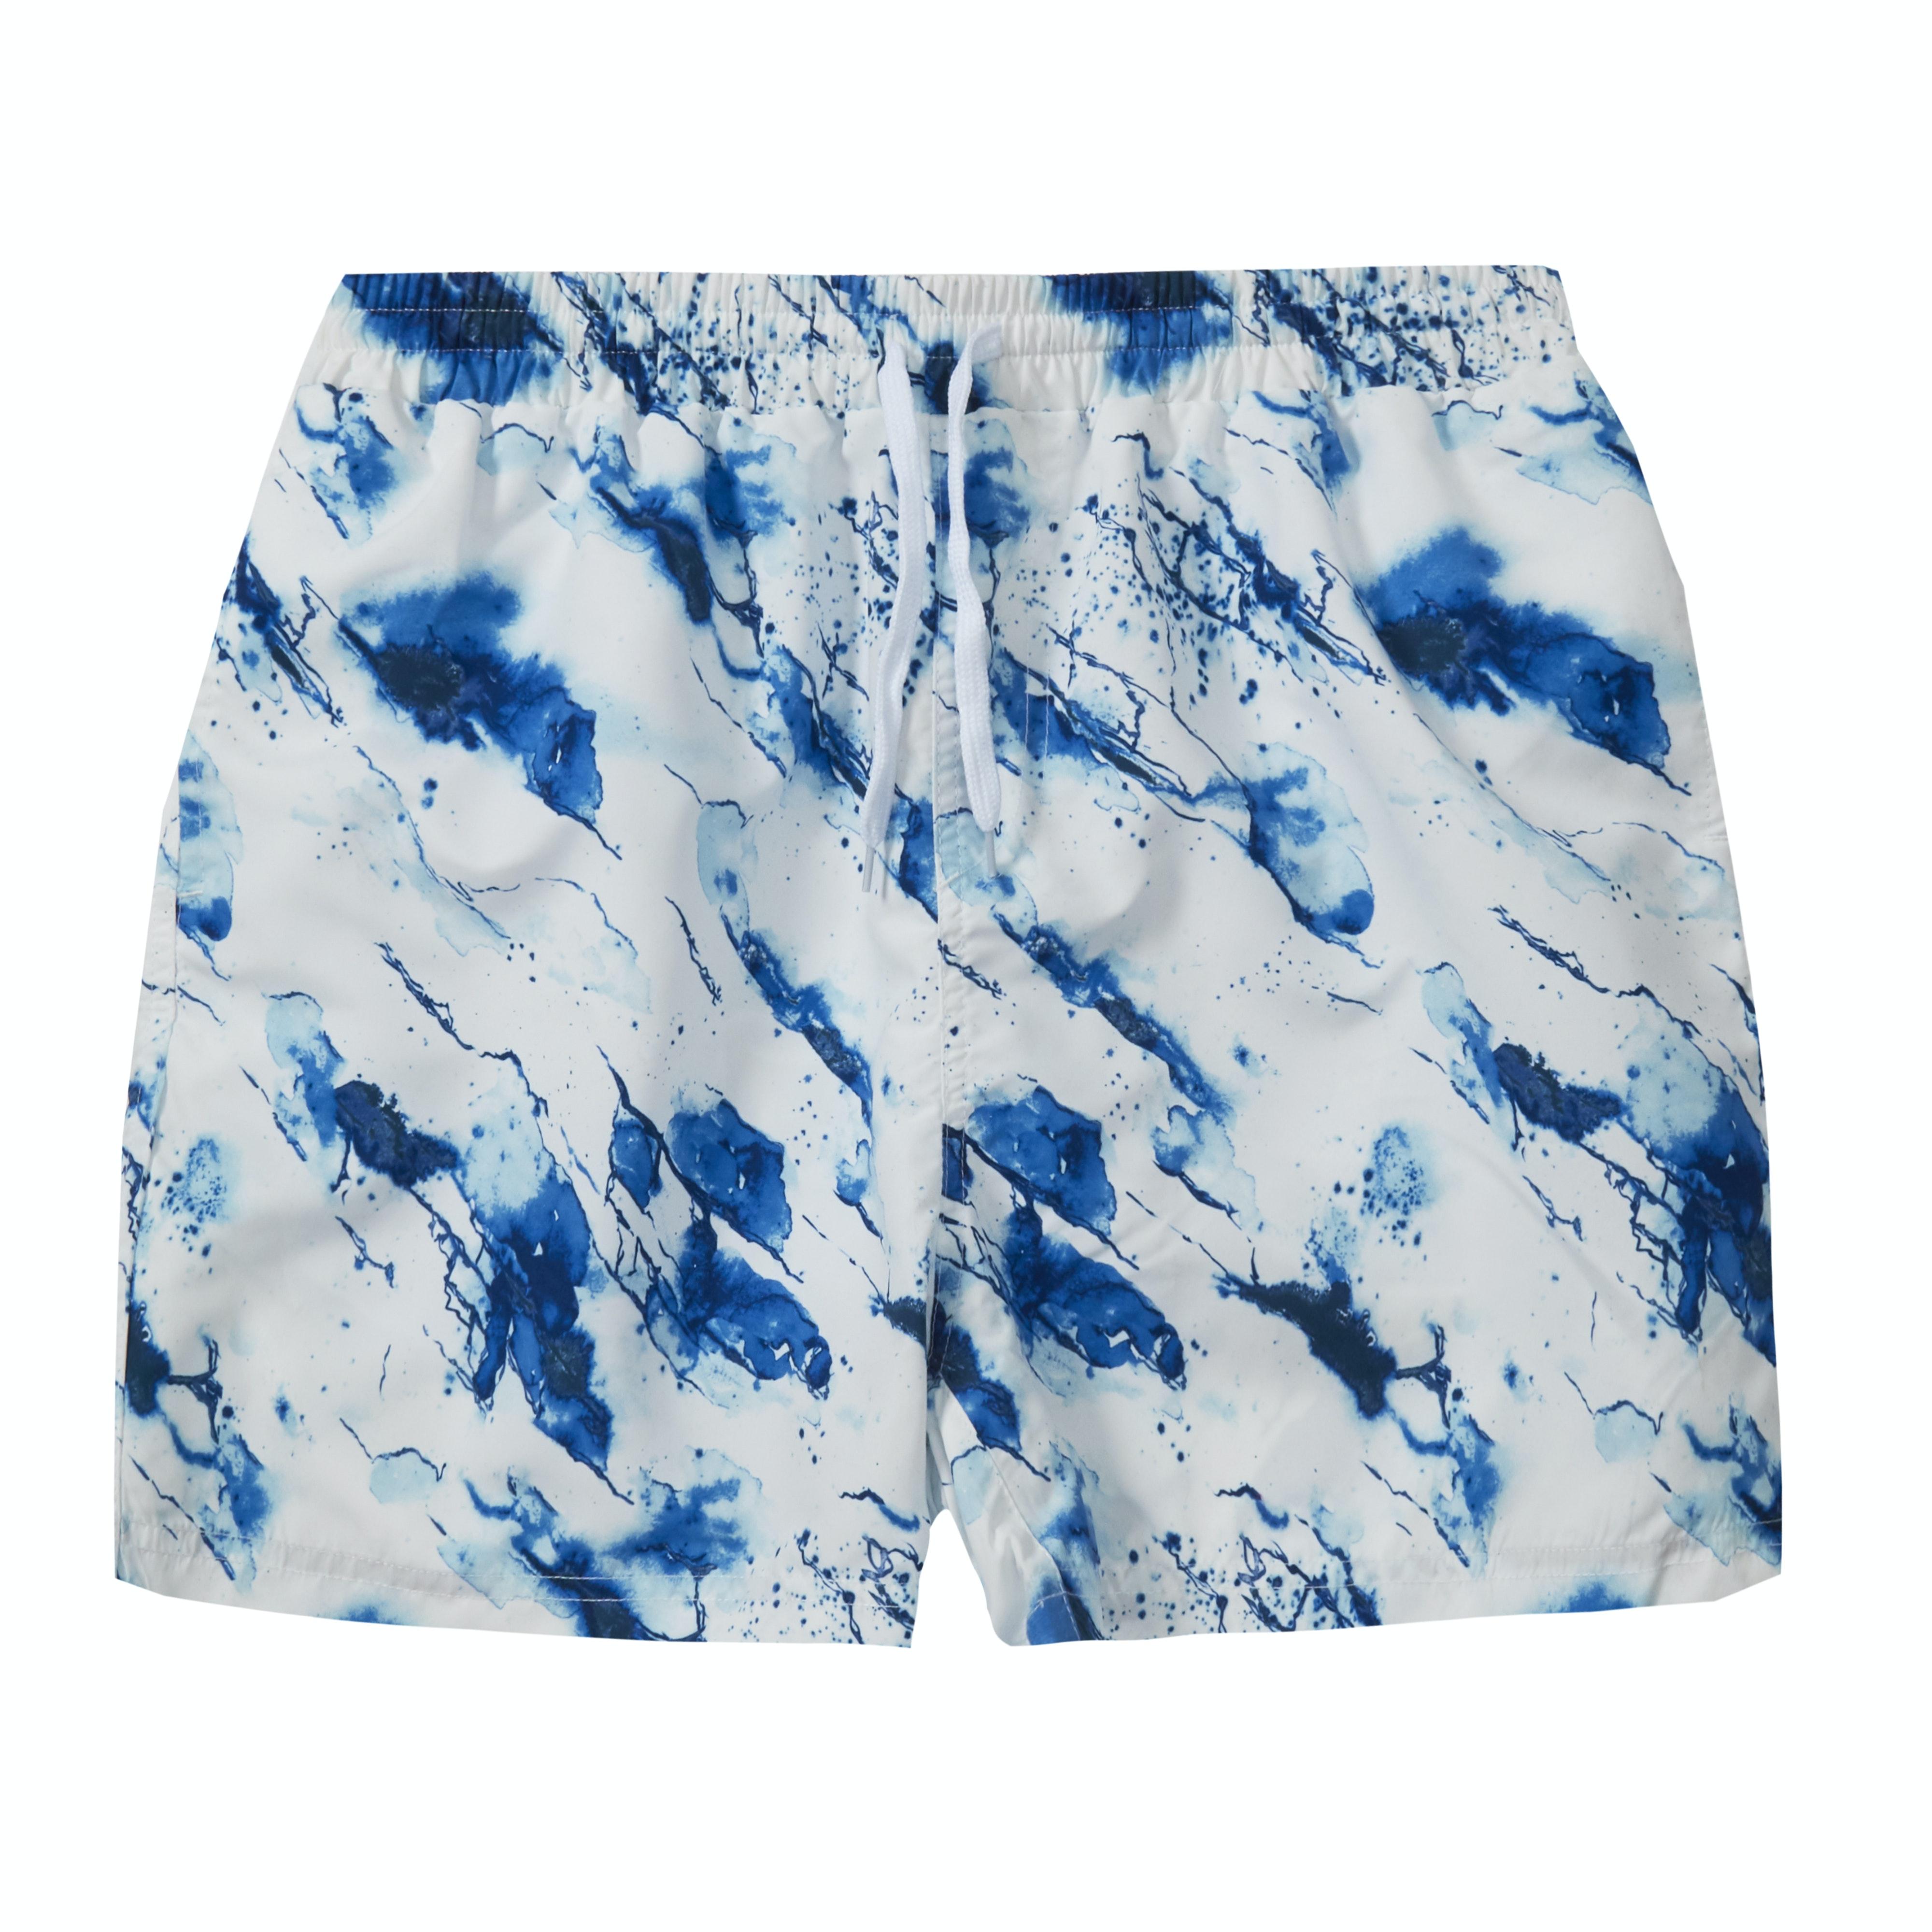 Baum Splash Print Swim Shorts White